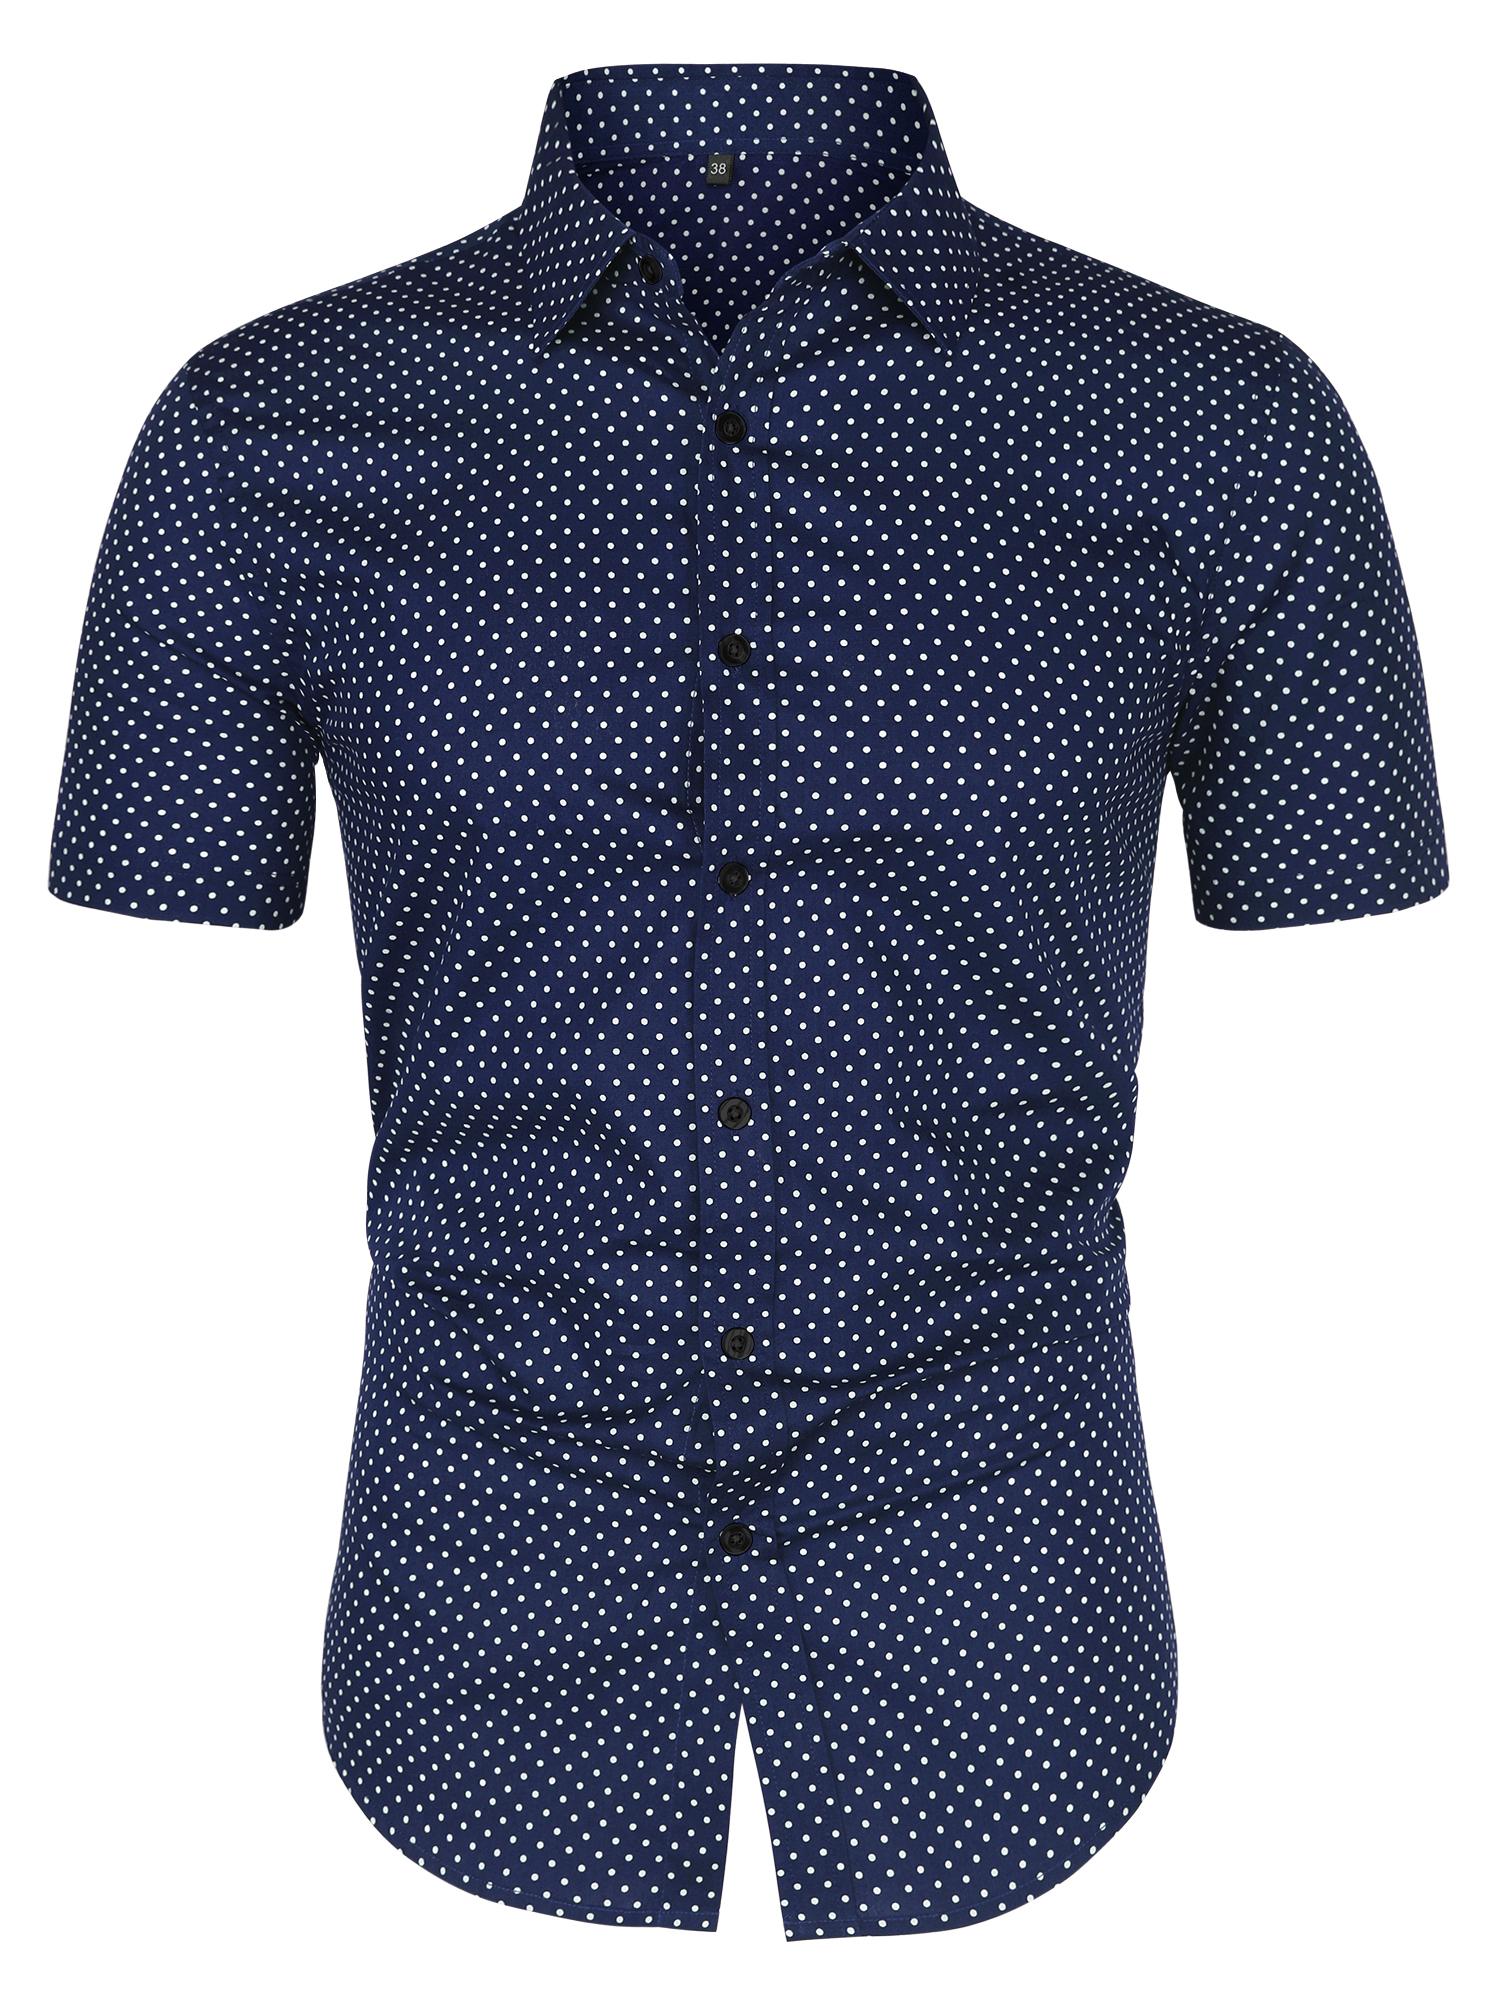 Men Short Sleeves Button Up Cotton Polka Dots Shirt Blue M